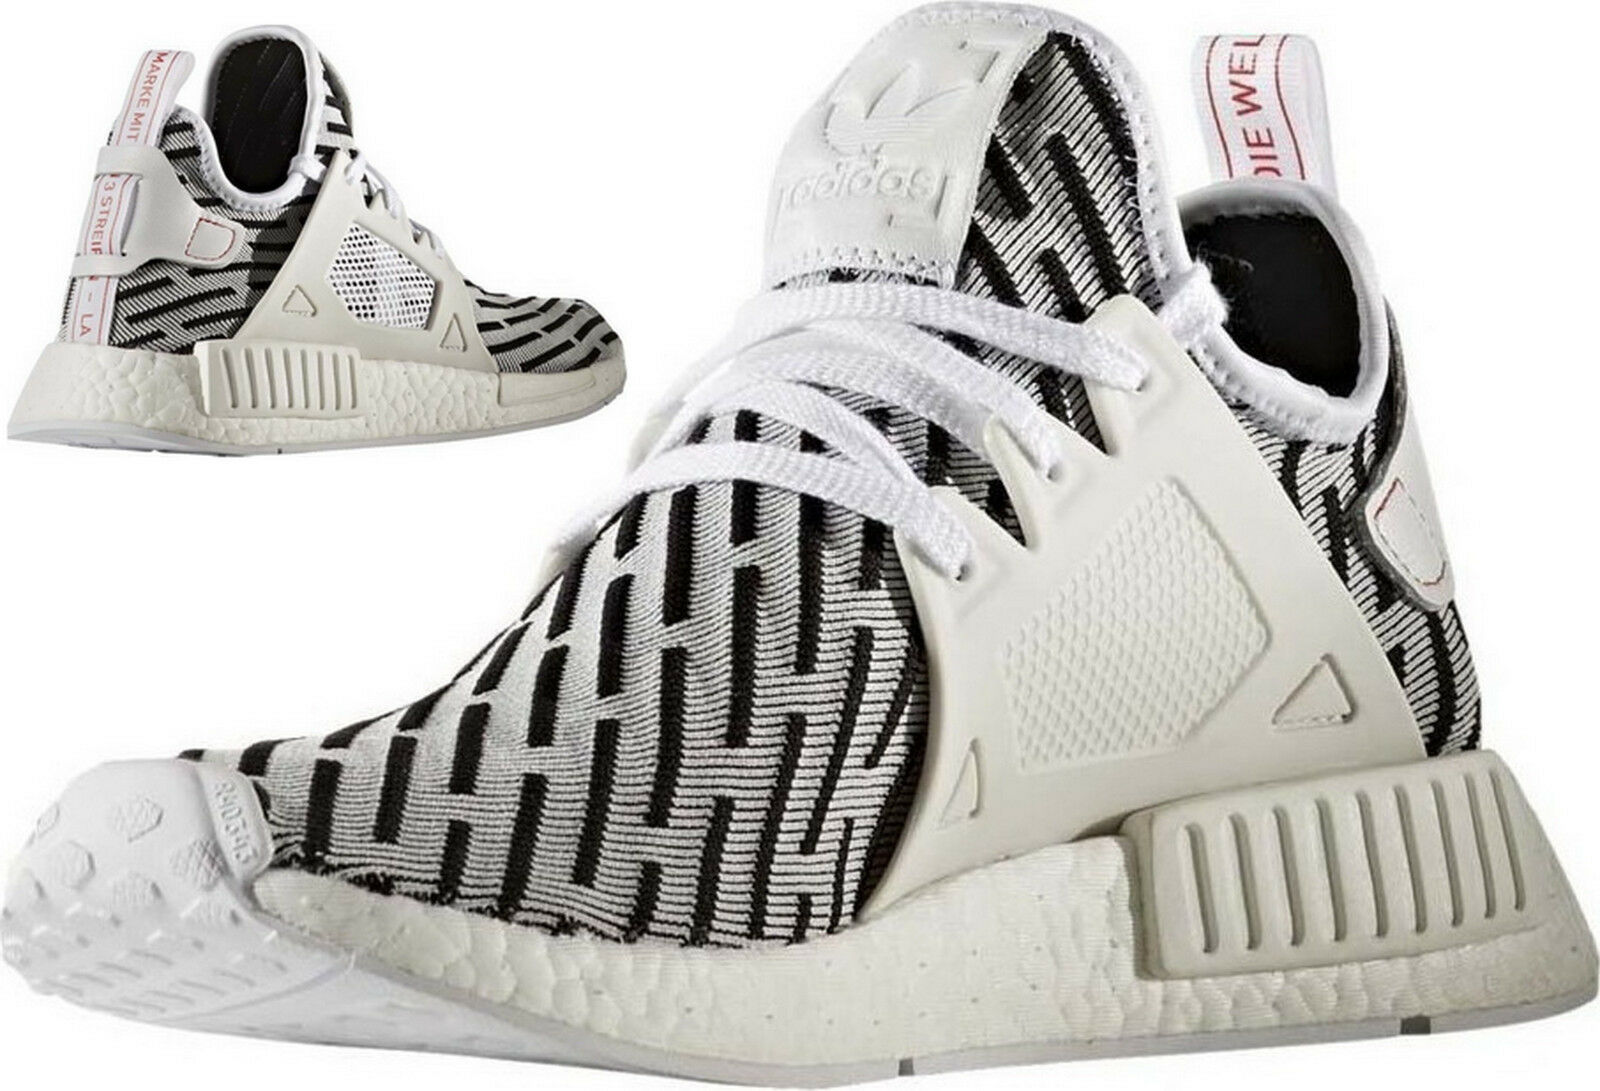 Adidas Adidas Adidas NMD XR1 Originals Primeknit  Zebra  Turnschuhe Runner Boost BB2911 21bd60